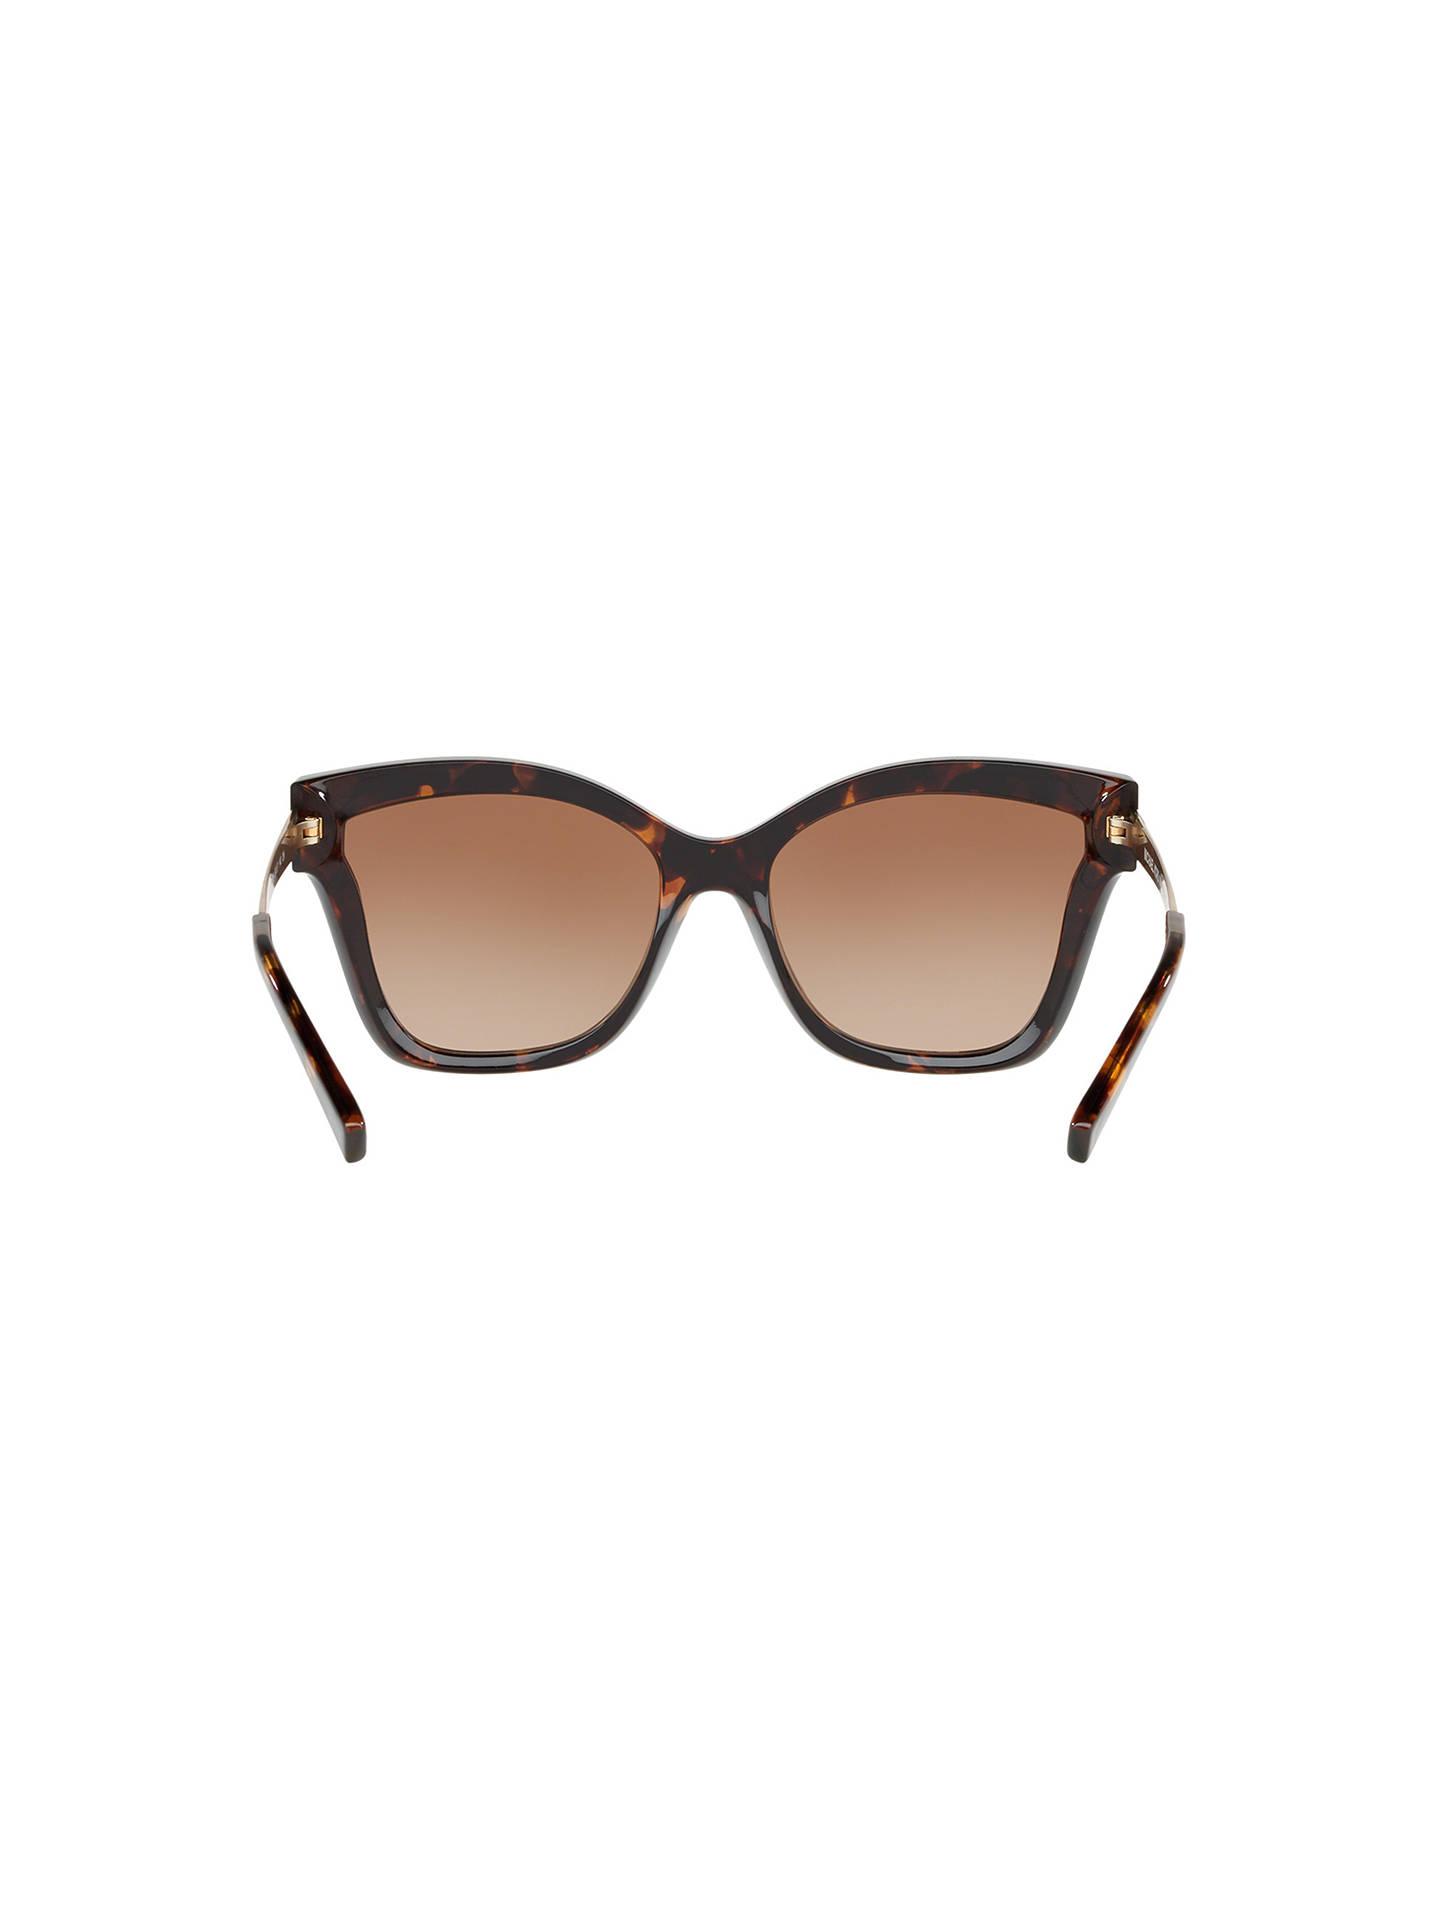 a20b96acca Michael Kors MK2072 Women s Barbados Square Sunglasses at John Lewis ...